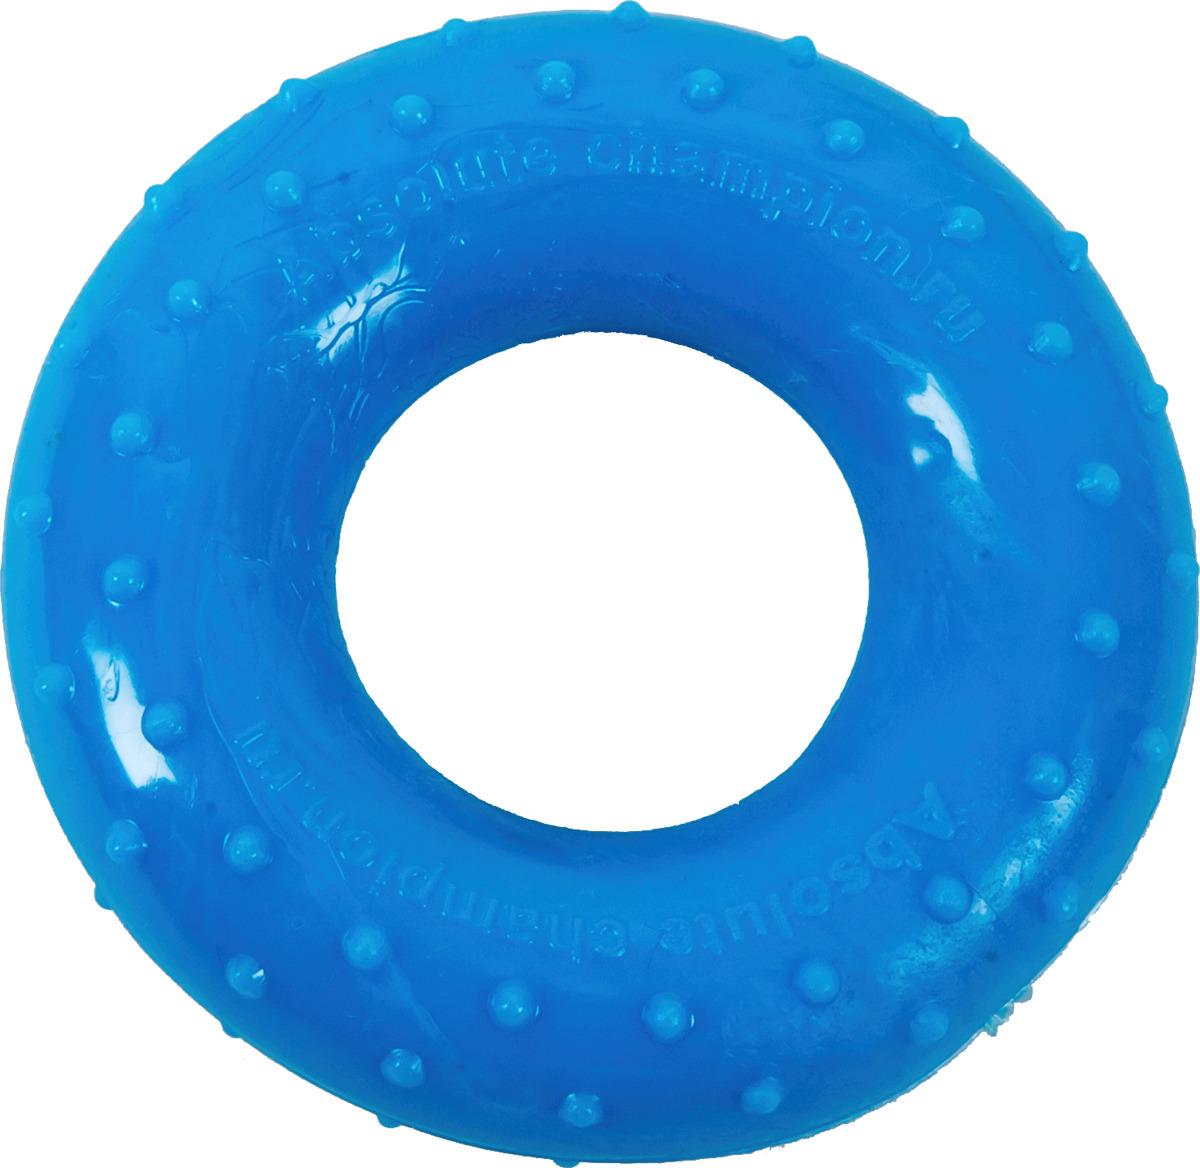 Эспандер Absolute Champion, 4690337010504, синий, усилие 30 кг